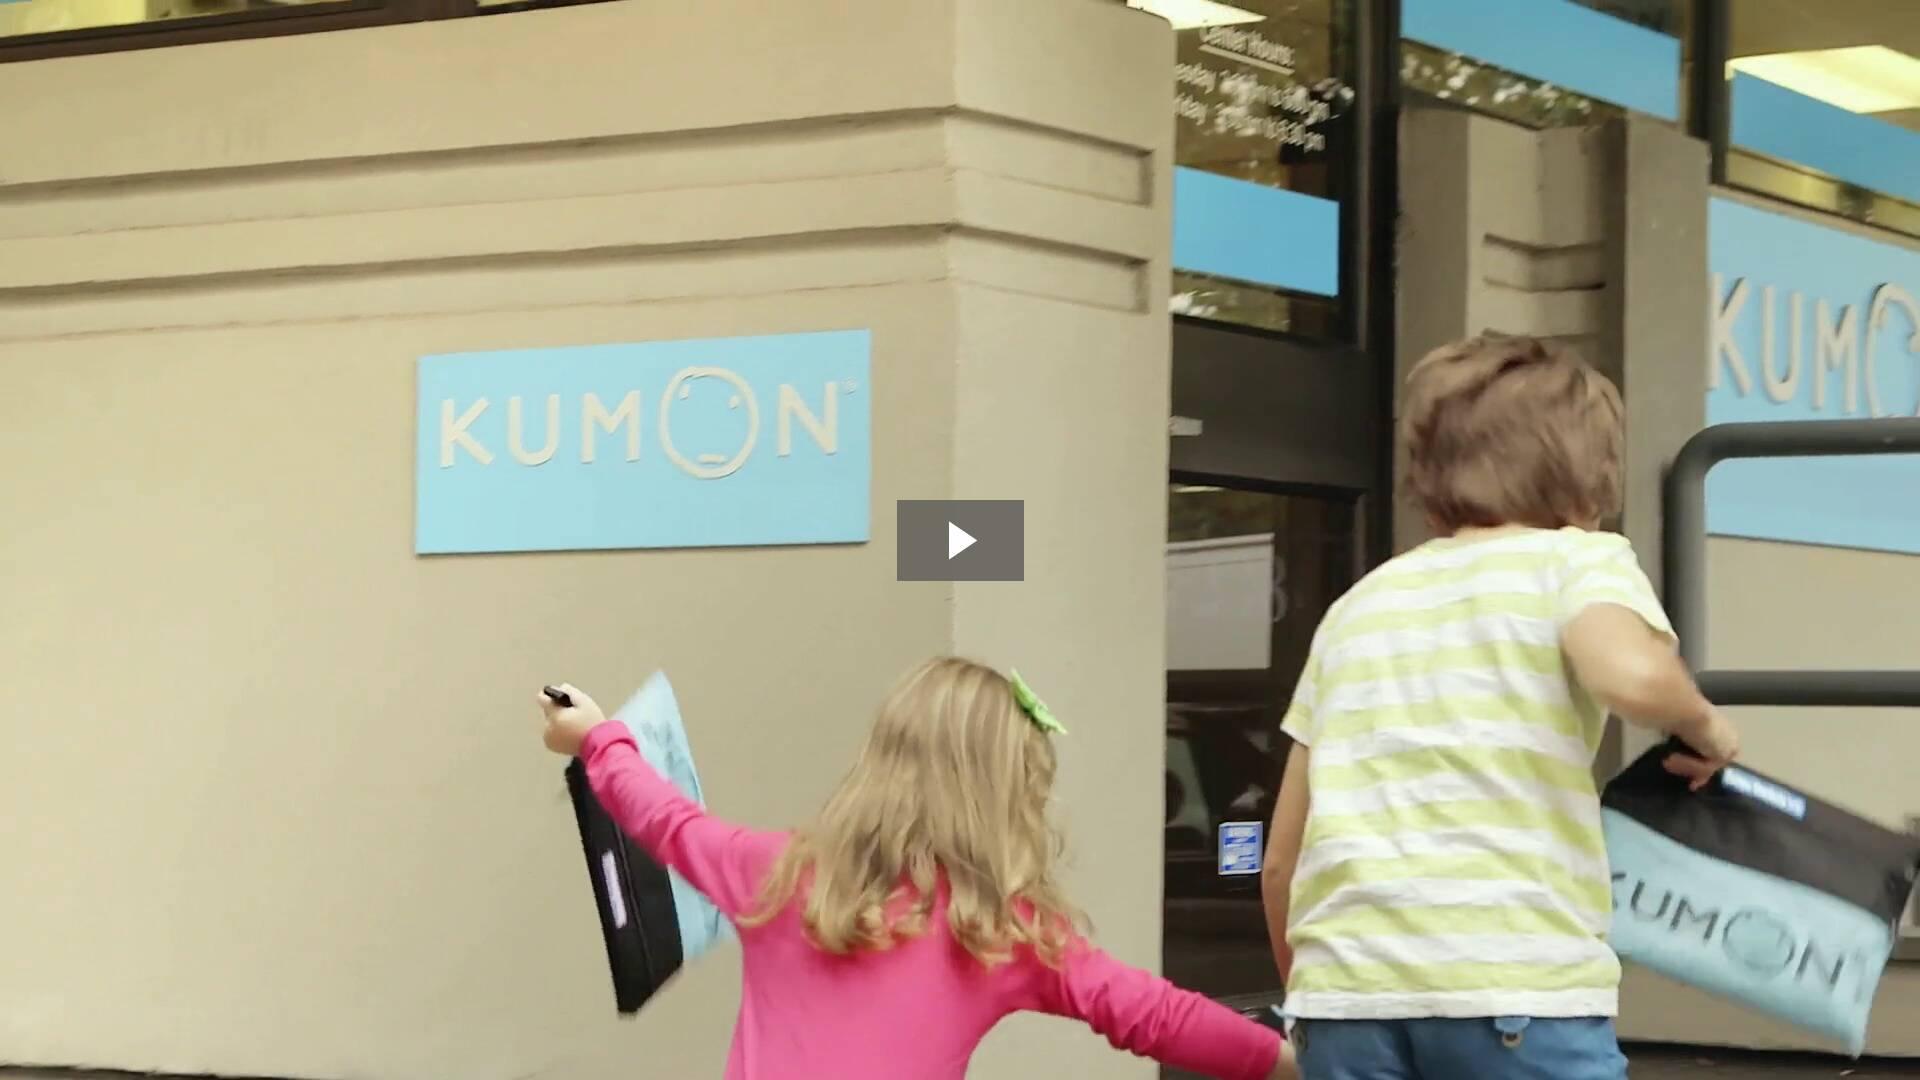 Kumon Global Video thumbnail